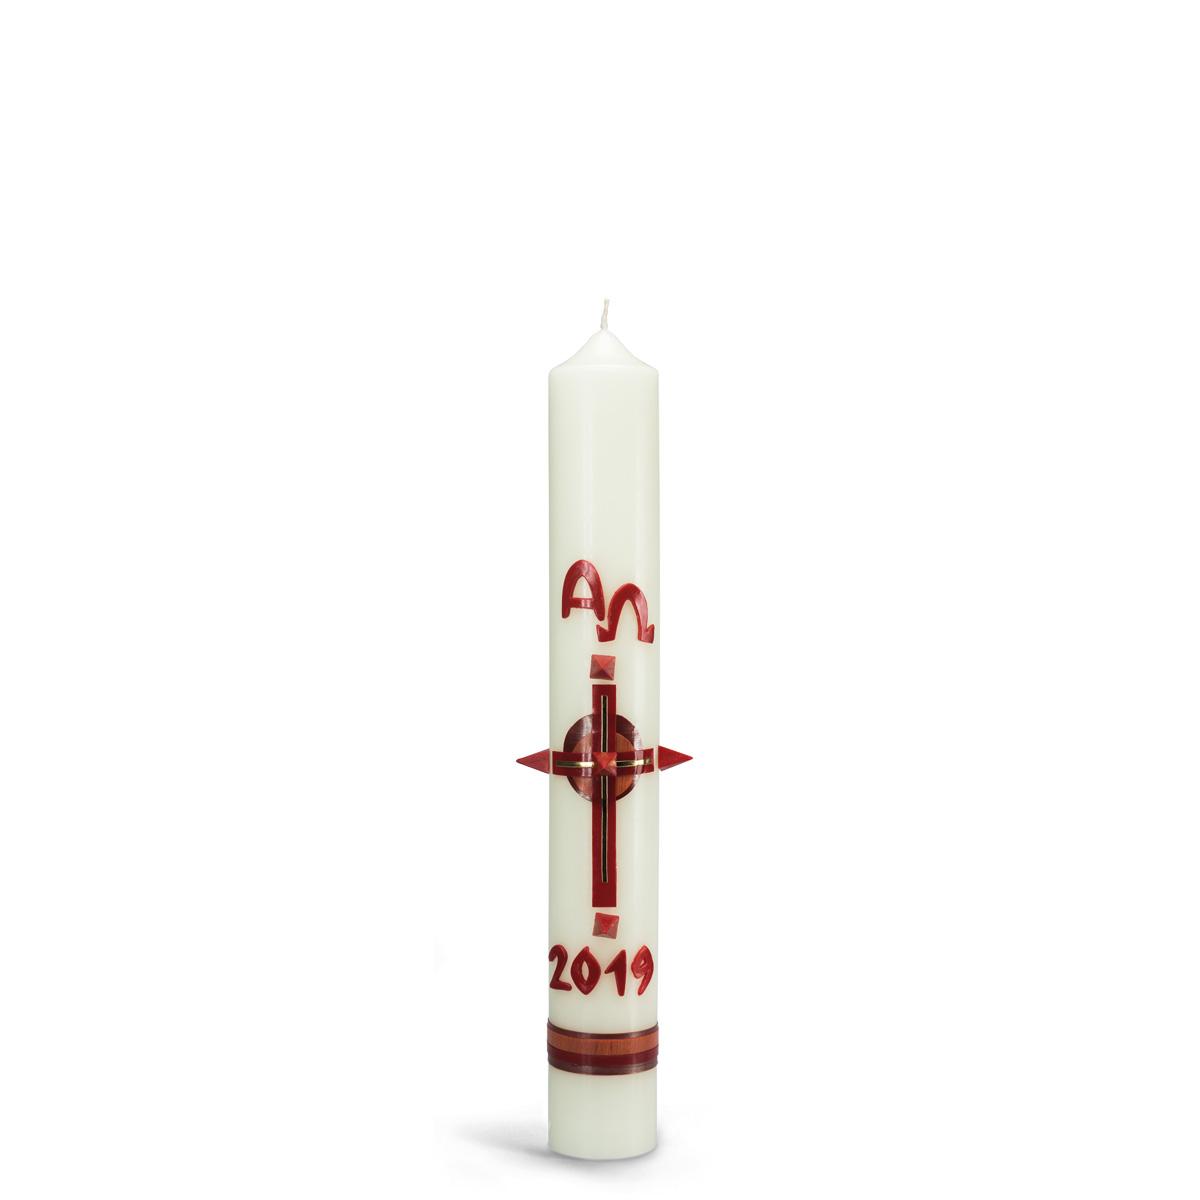 Osterkerze, 18.6009, Kreuz, rot, mit roten Nägeln